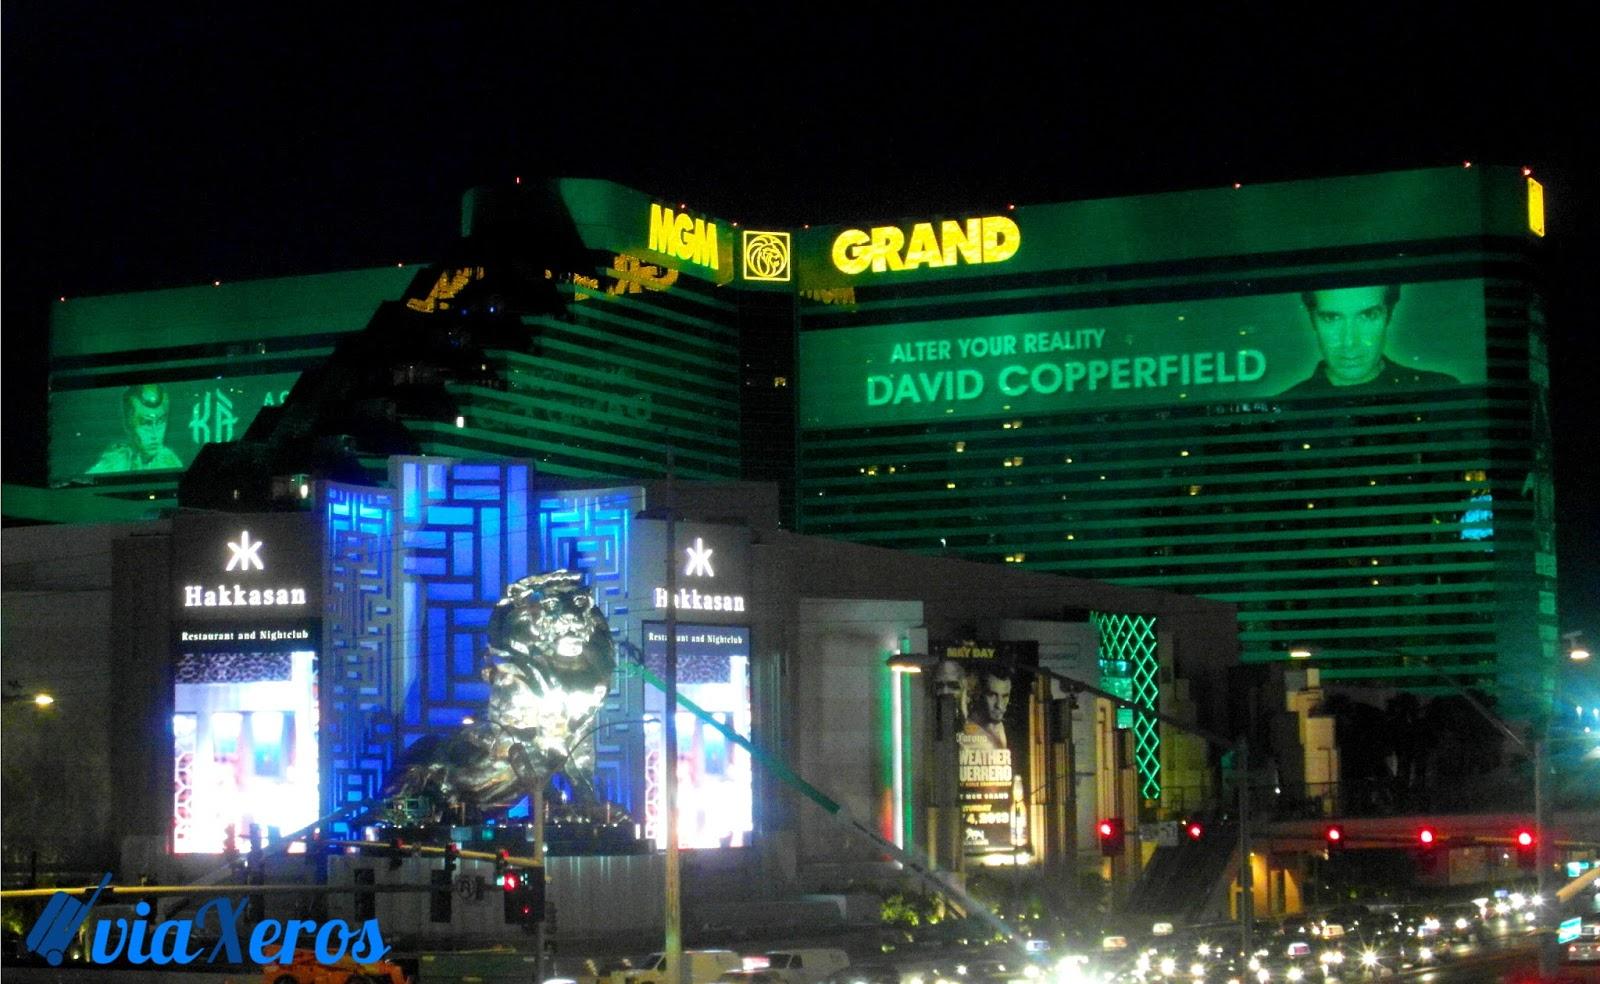 Blog de viajes :: viaxeros: Día 11: Las Vegas Sign, Outlet y Hoteles ...